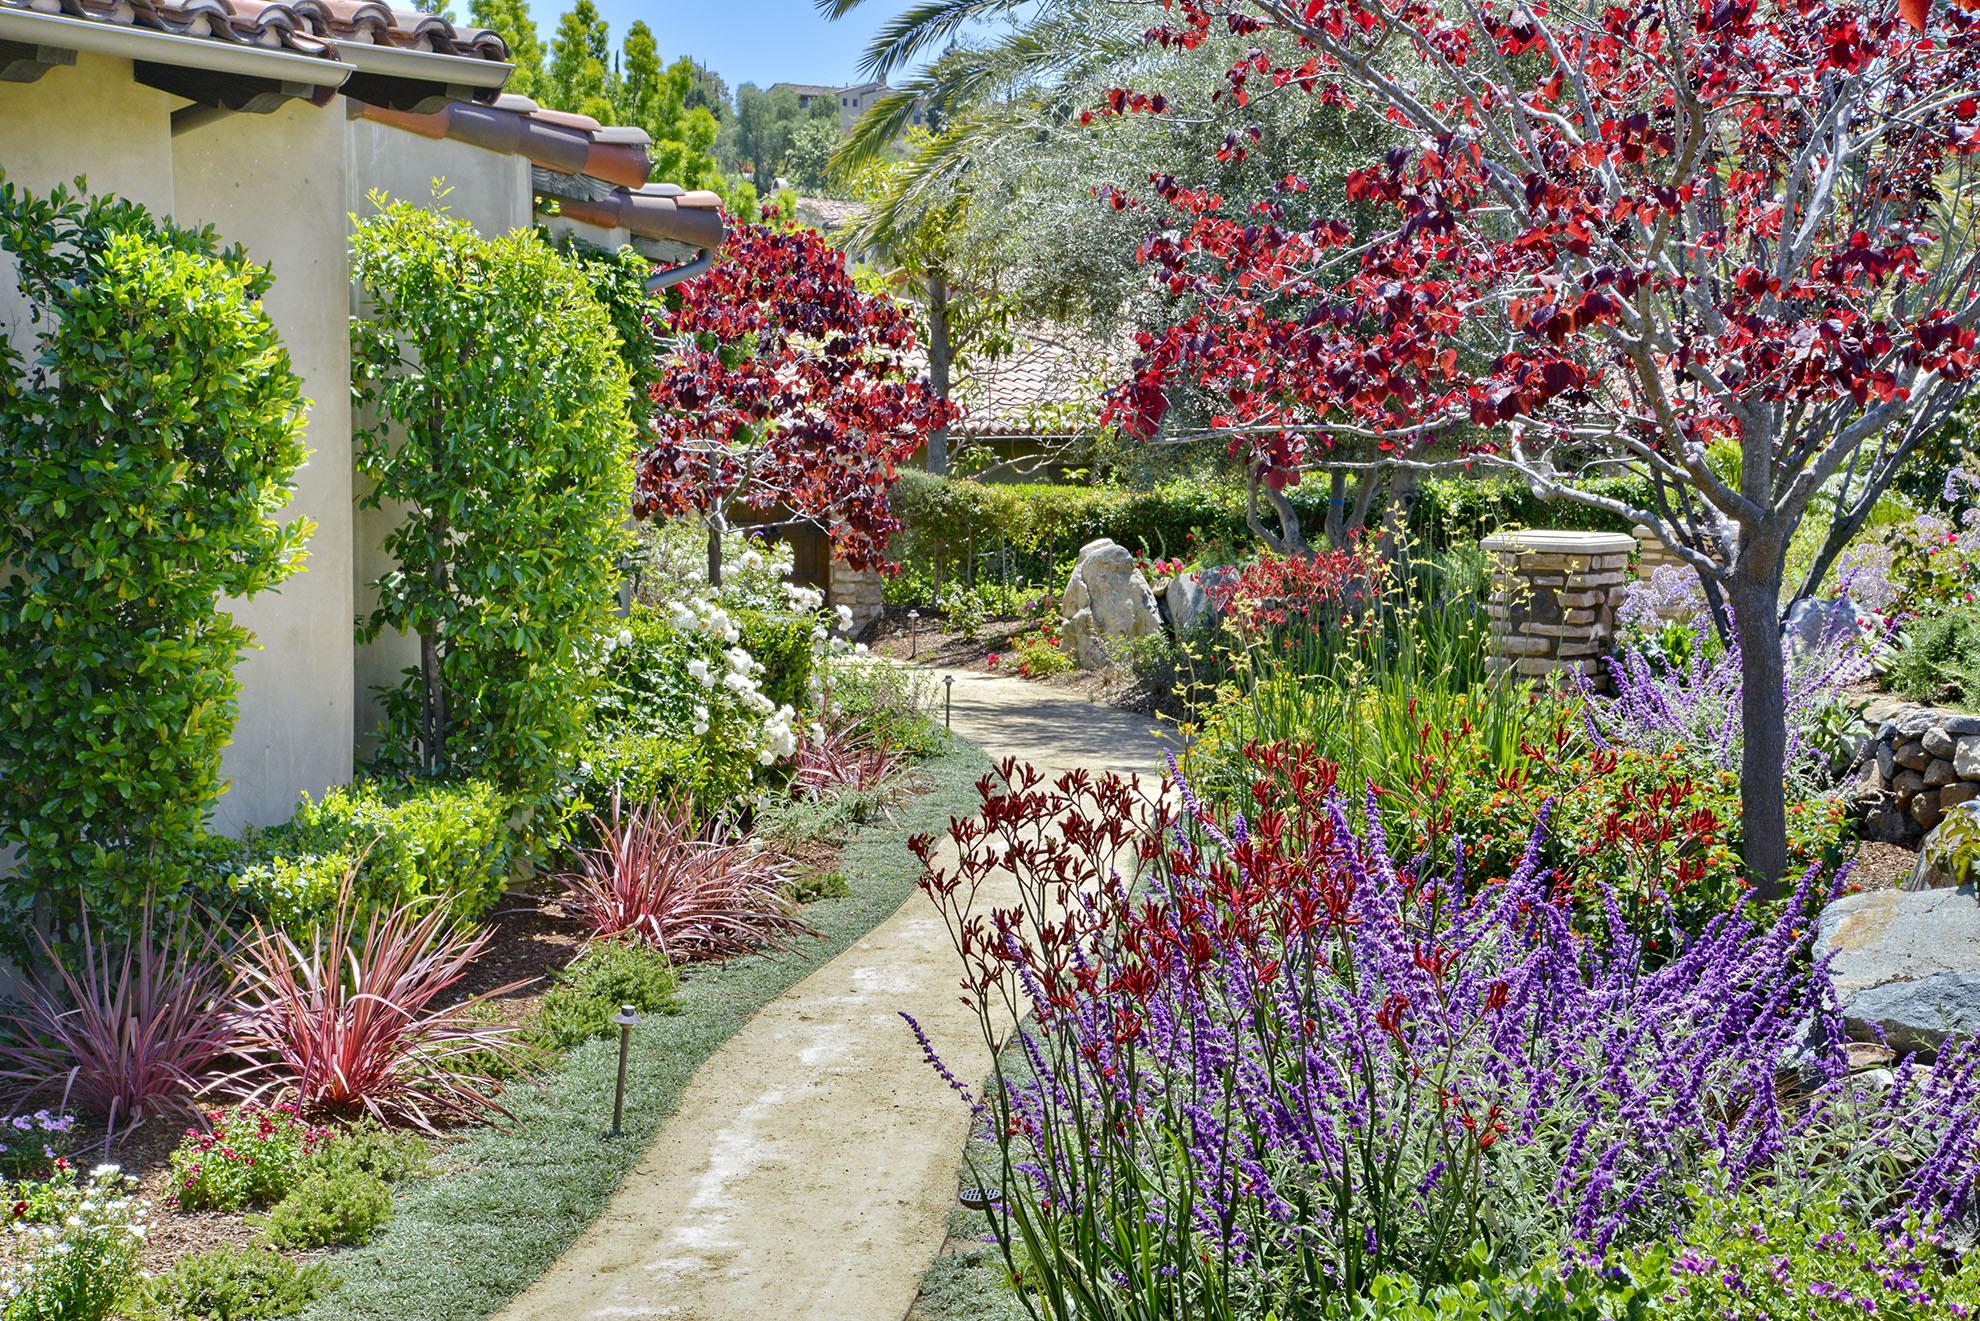 Butterfly Garden Rancho Santa Fe Torrey Pines Landscape Company San Diego Landscape Design Build Maintenance